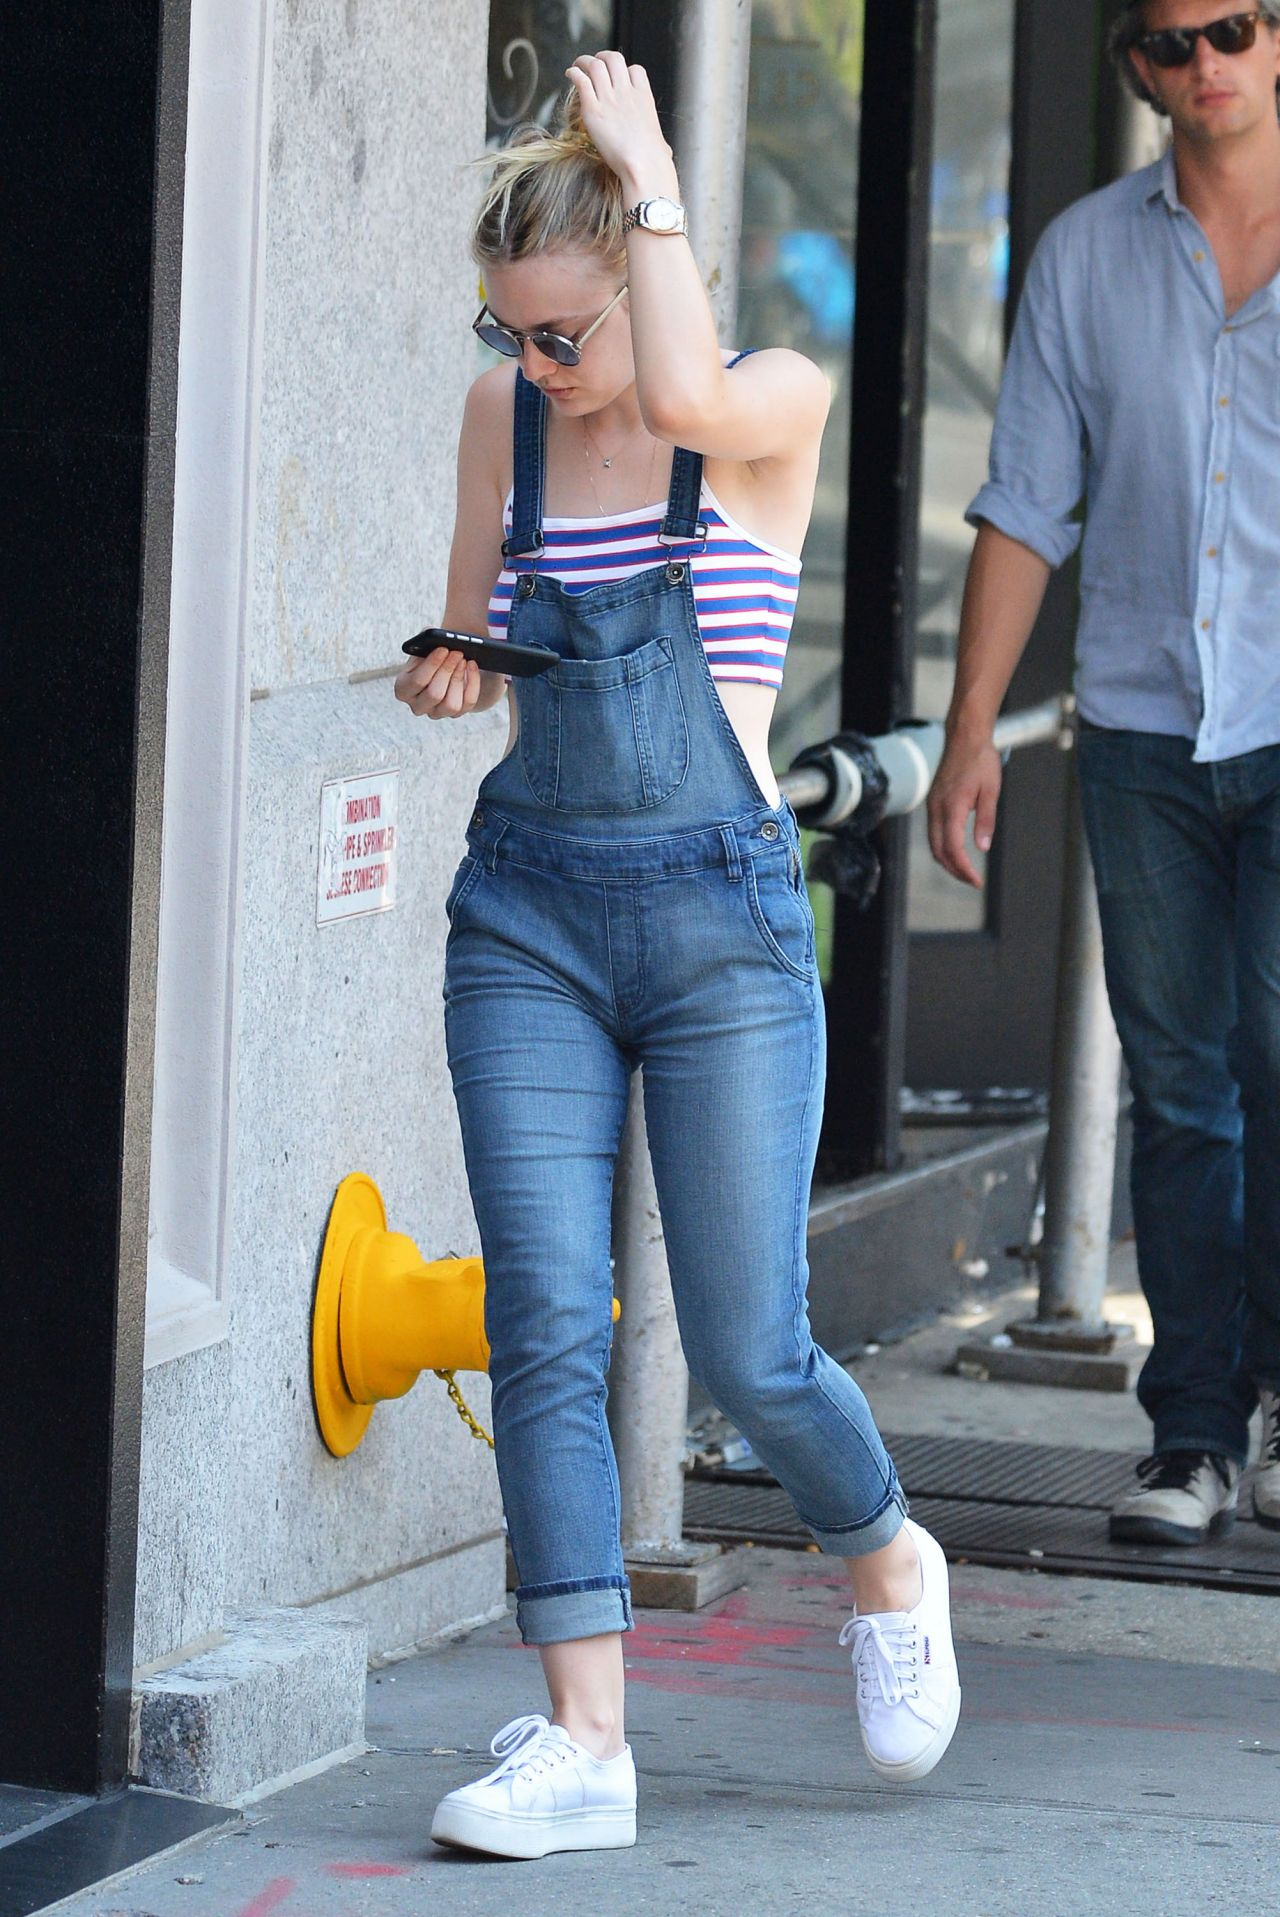 Dakota Fanning Jumpsuit Street Style Out In New York